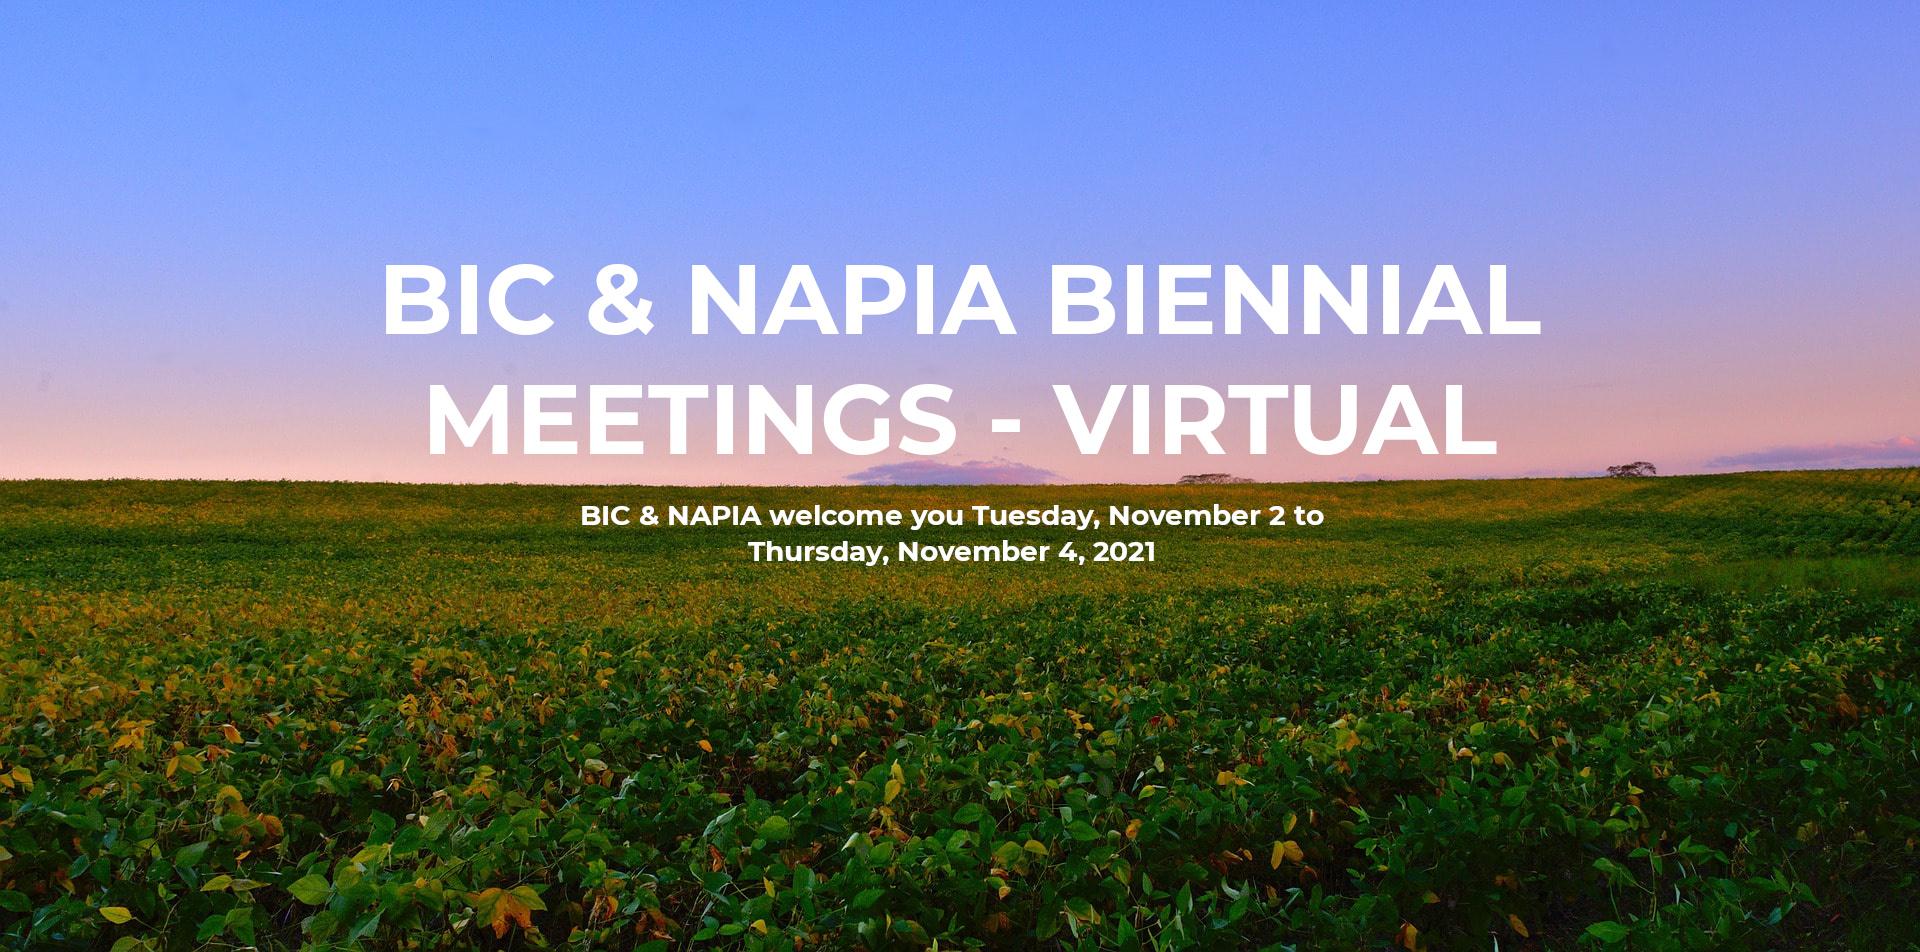 BIC & NAPIA Biennial Meetings - Virtual